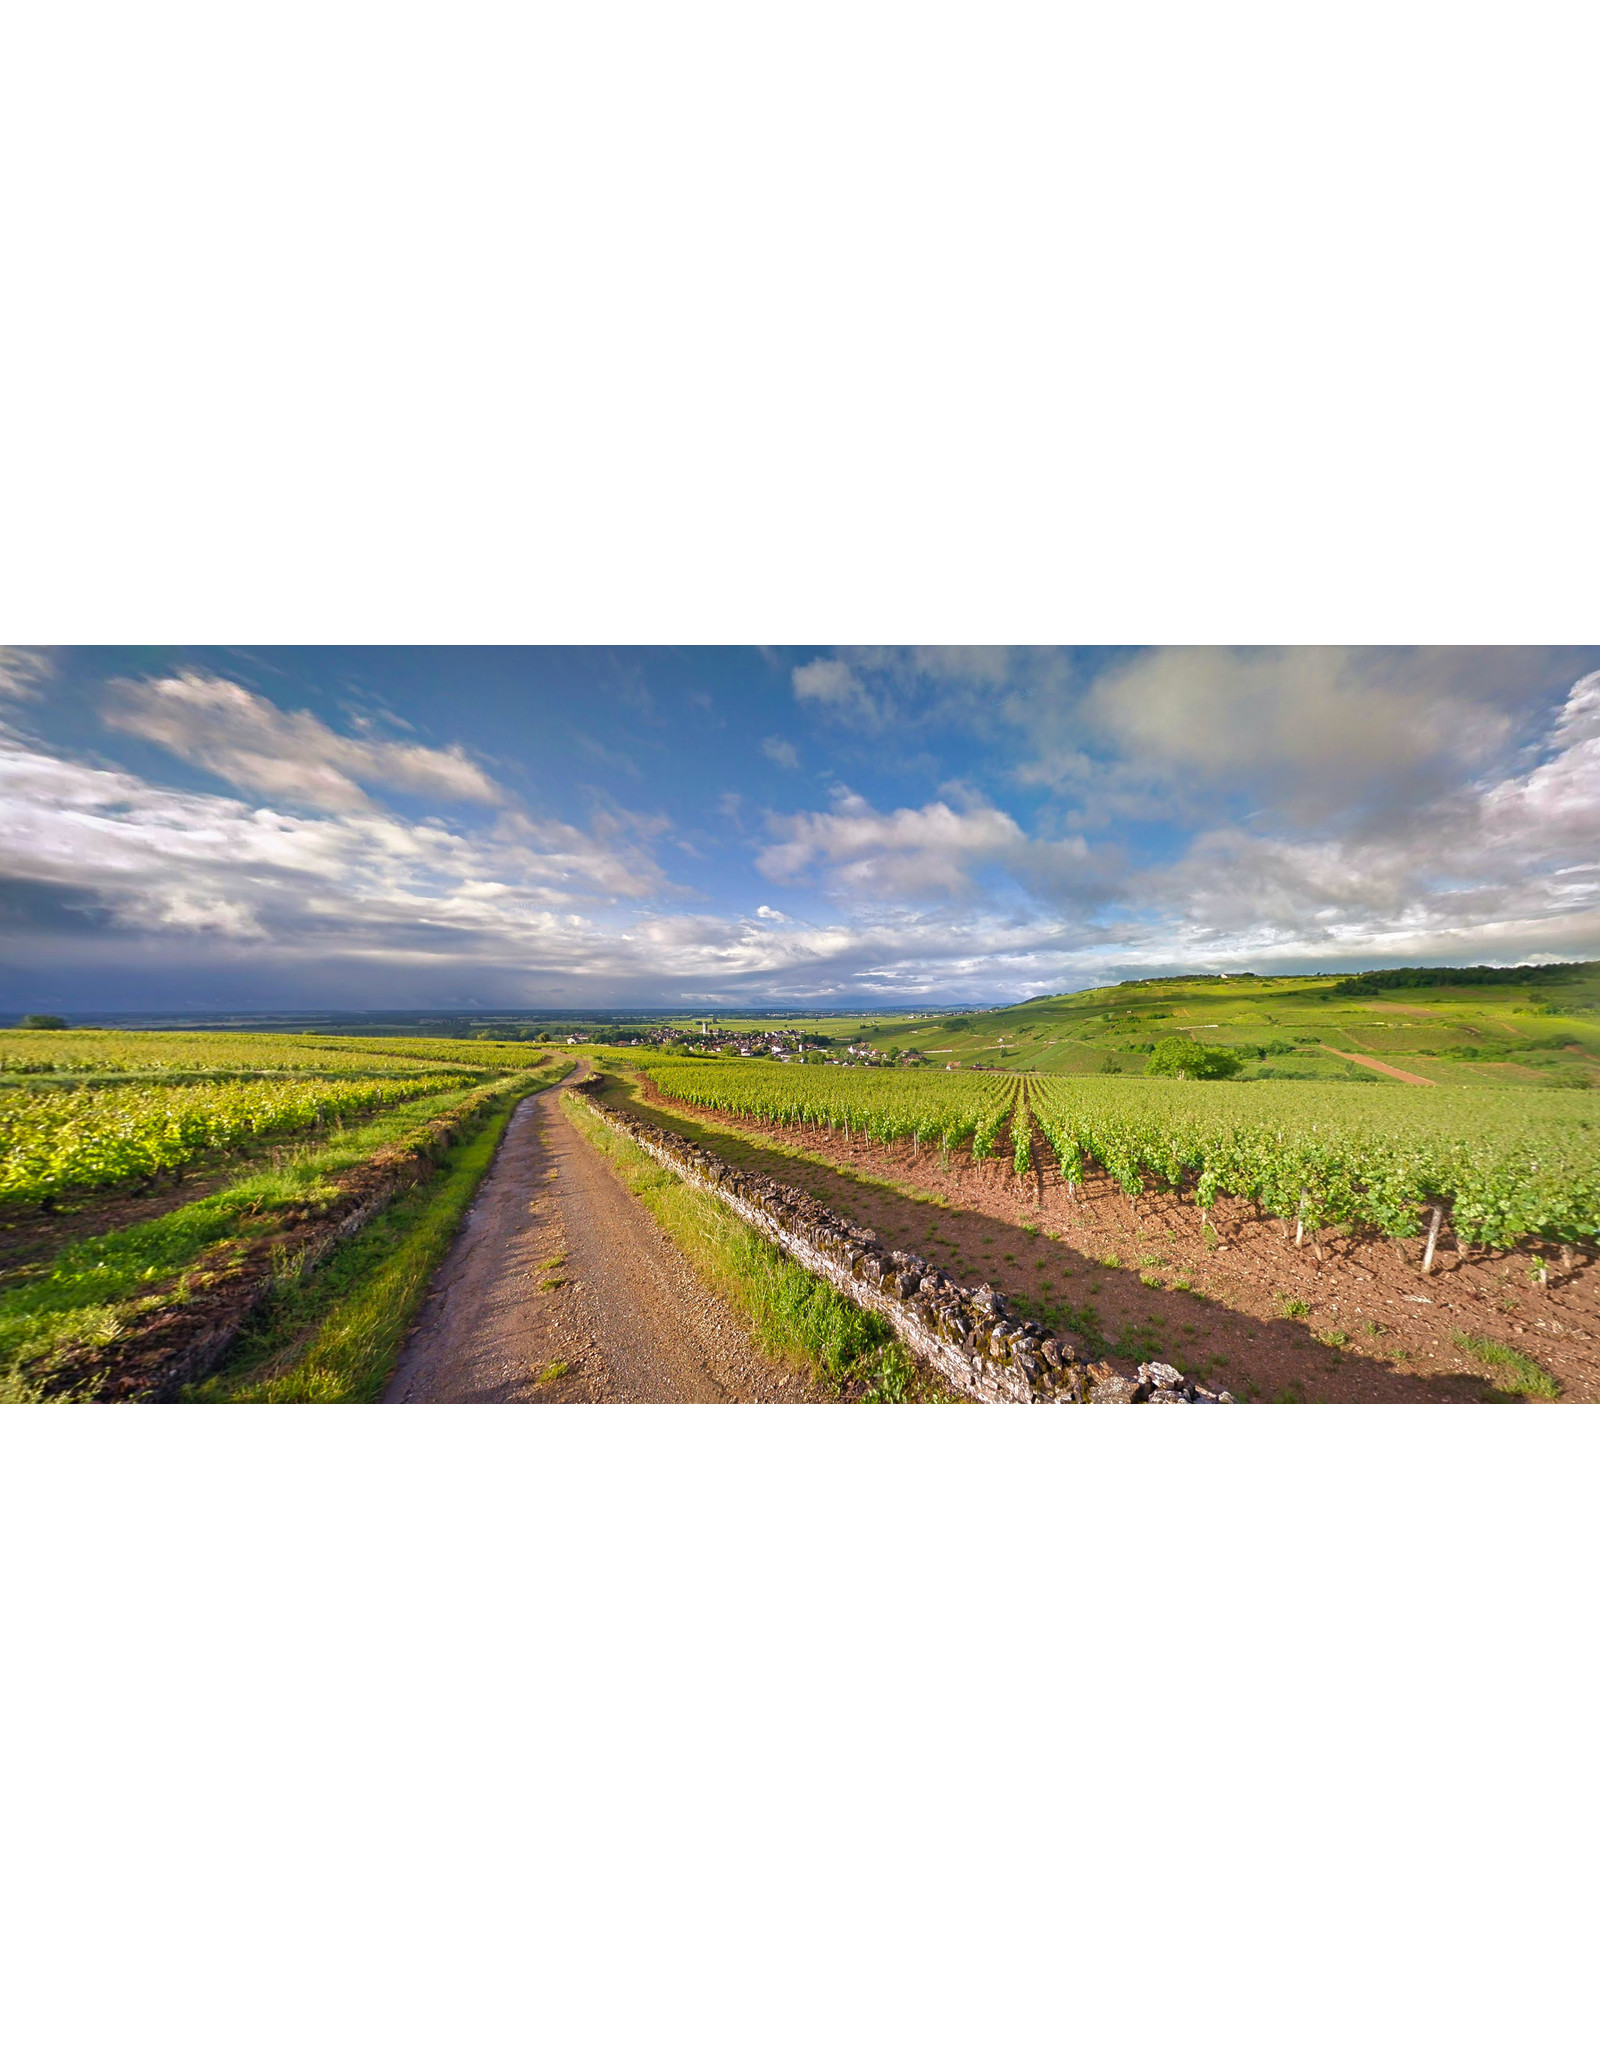 Chardonnay Aubert Lefas Bourgogne Les Grandes Carelles WHITE 19